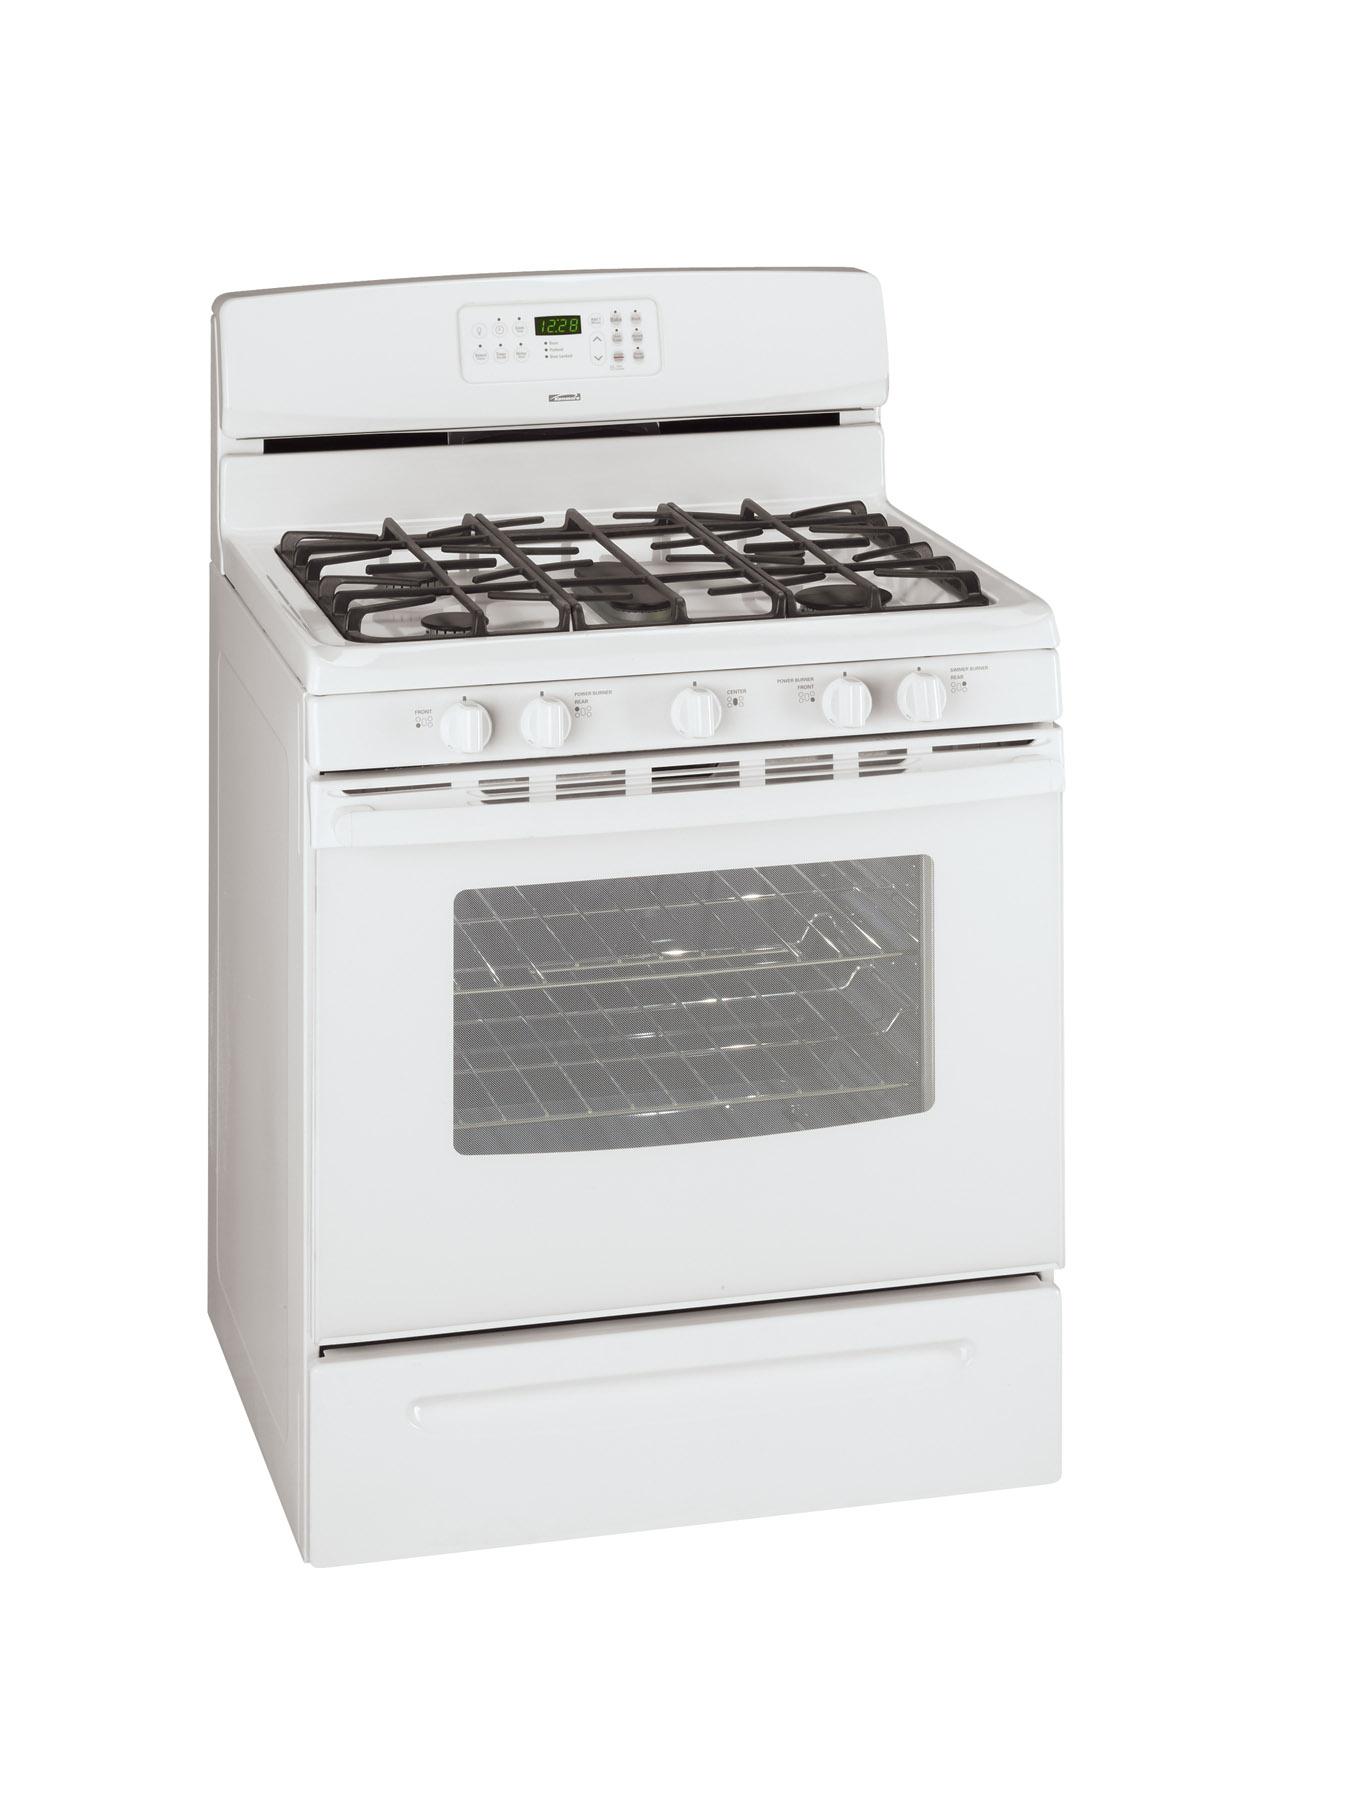 Kenmore Range/Stove/Oven Model 790.77462804 Parts